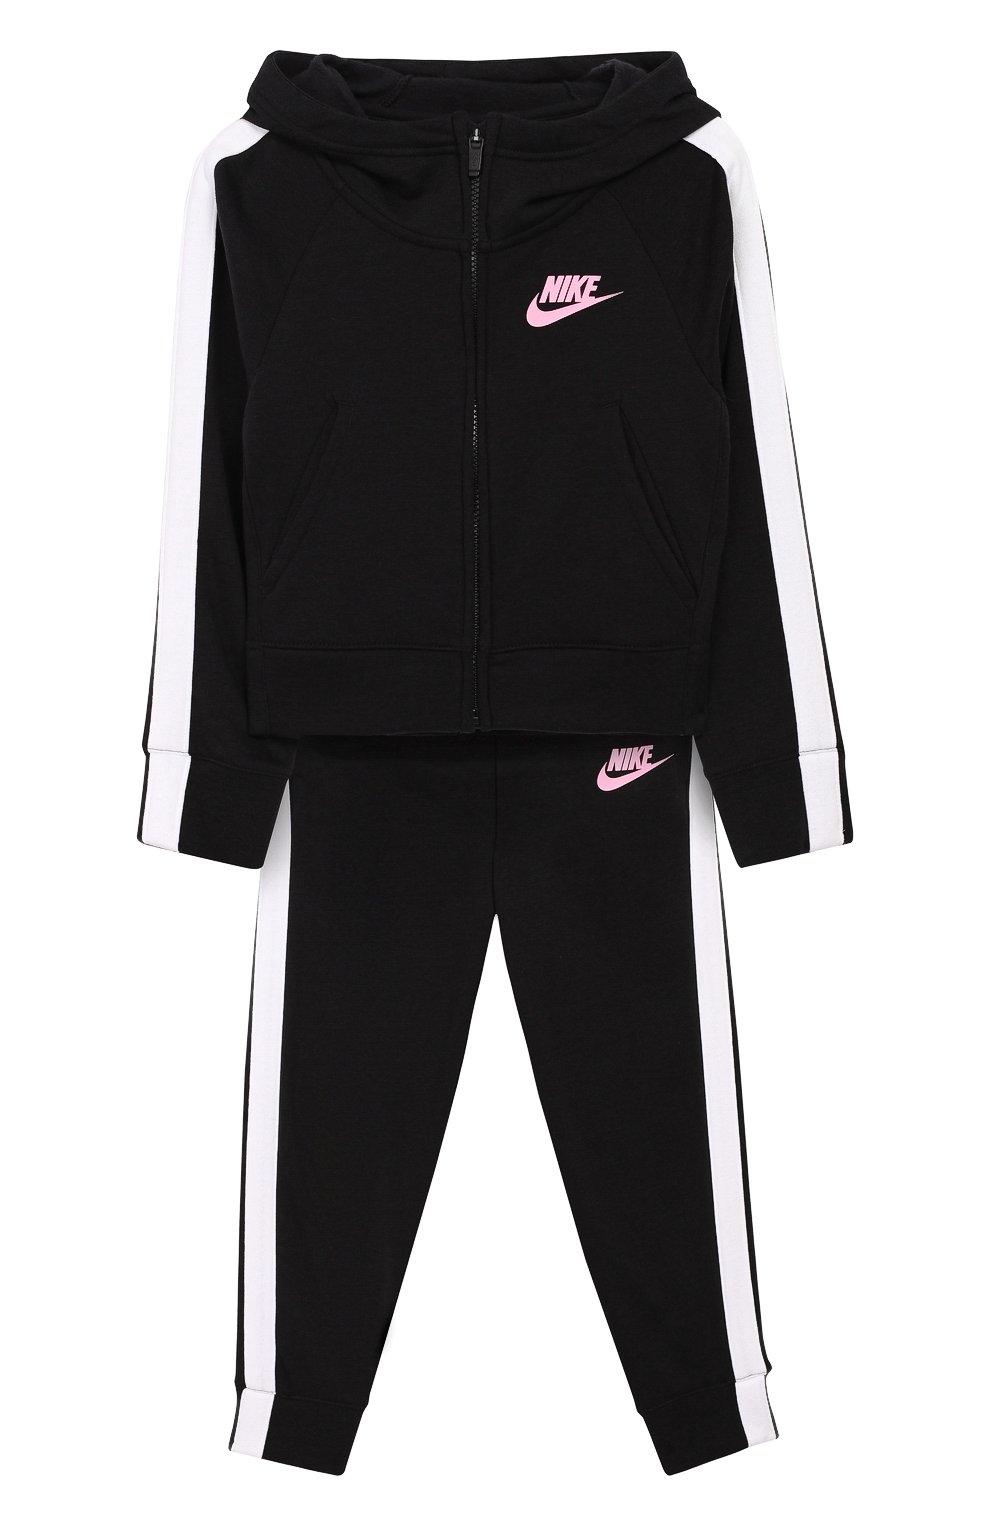 bdd5bdc2 Спортивный костюм NIKE черного цвета — купить за 4480 руб. в ...